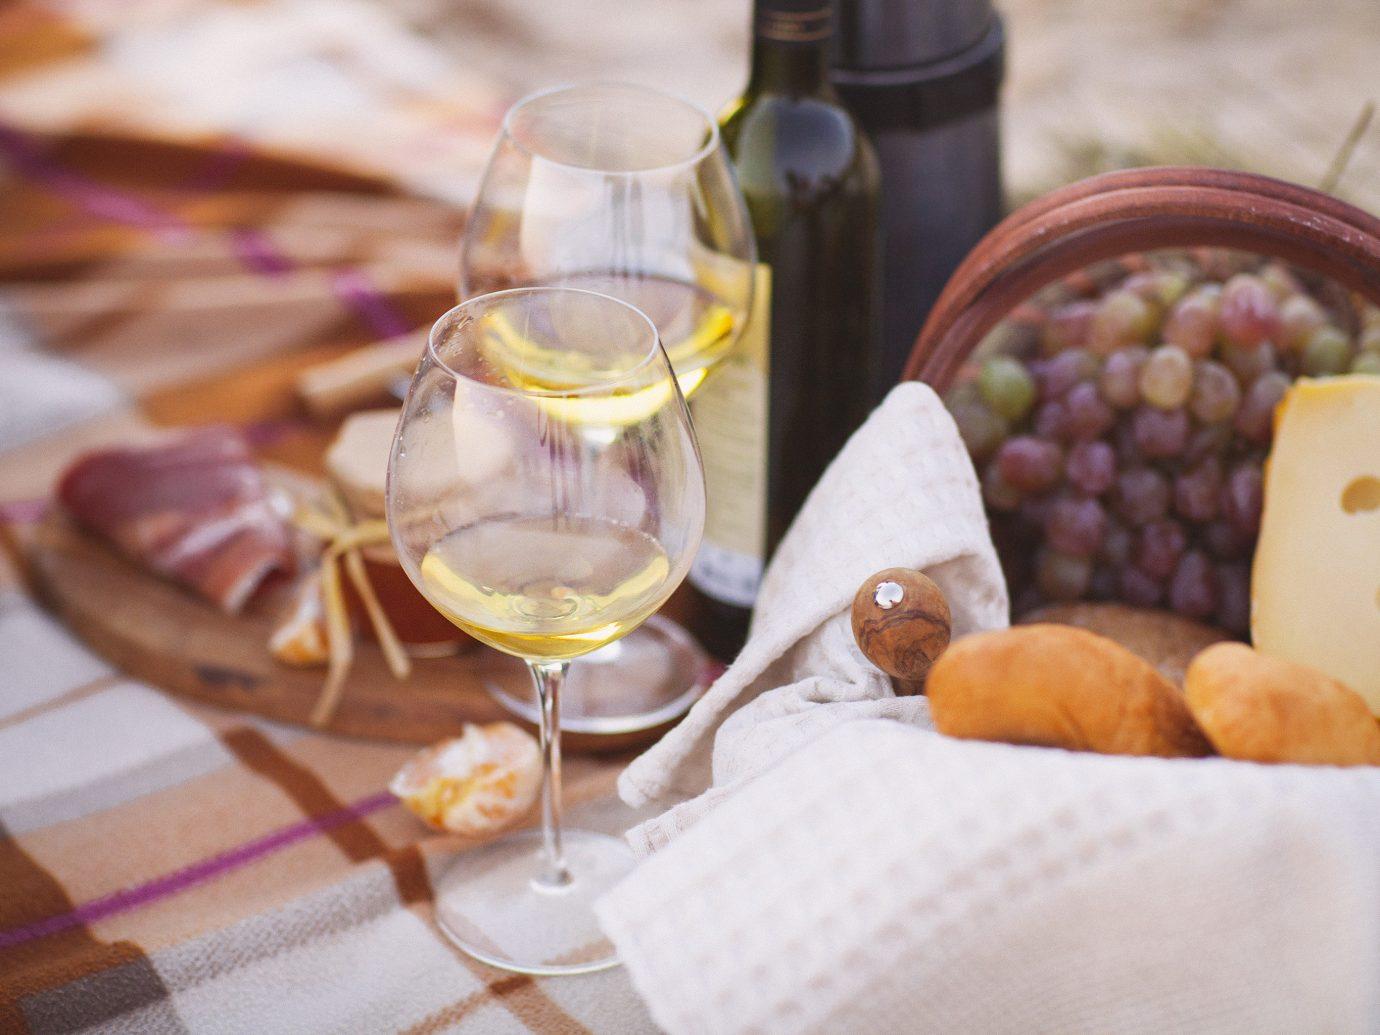 Style + Design table food cup brunch stemware tableware wine glass breakfast Drink flavor glass meal